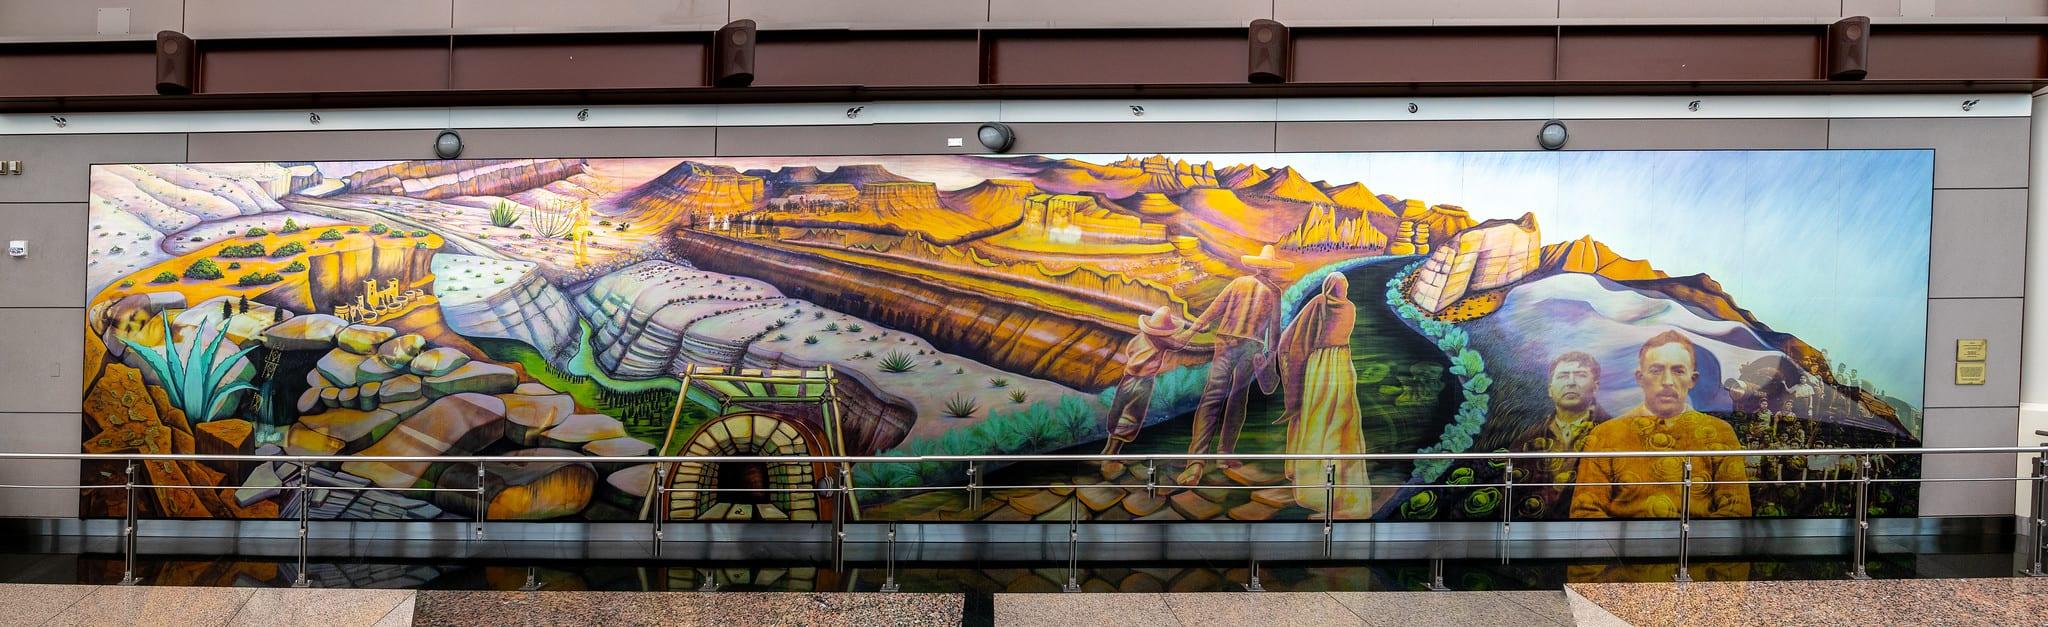 image of an art mural at denver international airport